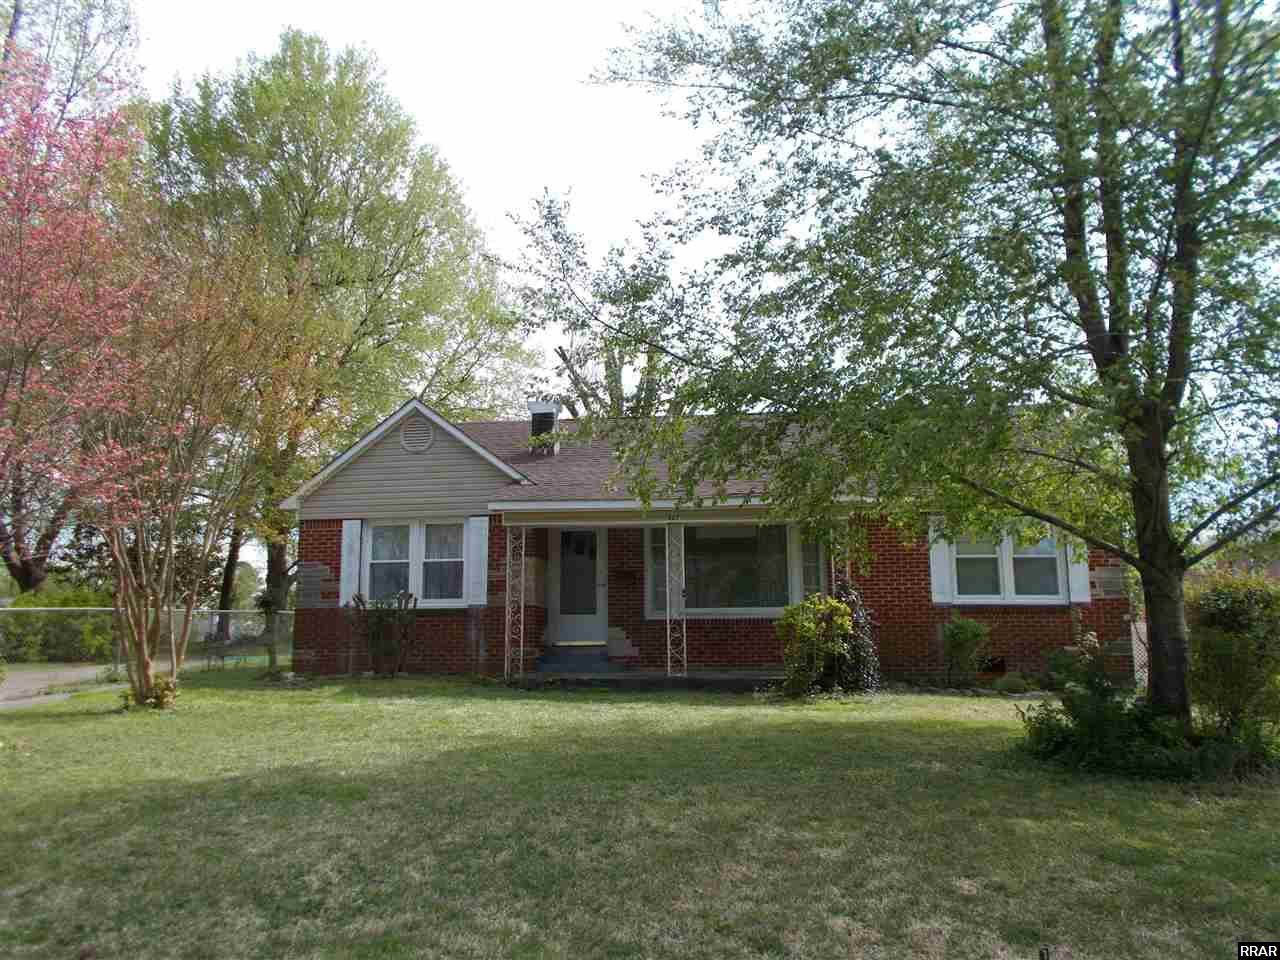 307 E Collinwood St, South Fulton, TN 38257 - 2 Bed, 1 Bath Single-Family  Home - MLS #40692 - 15 Photos | Trulia